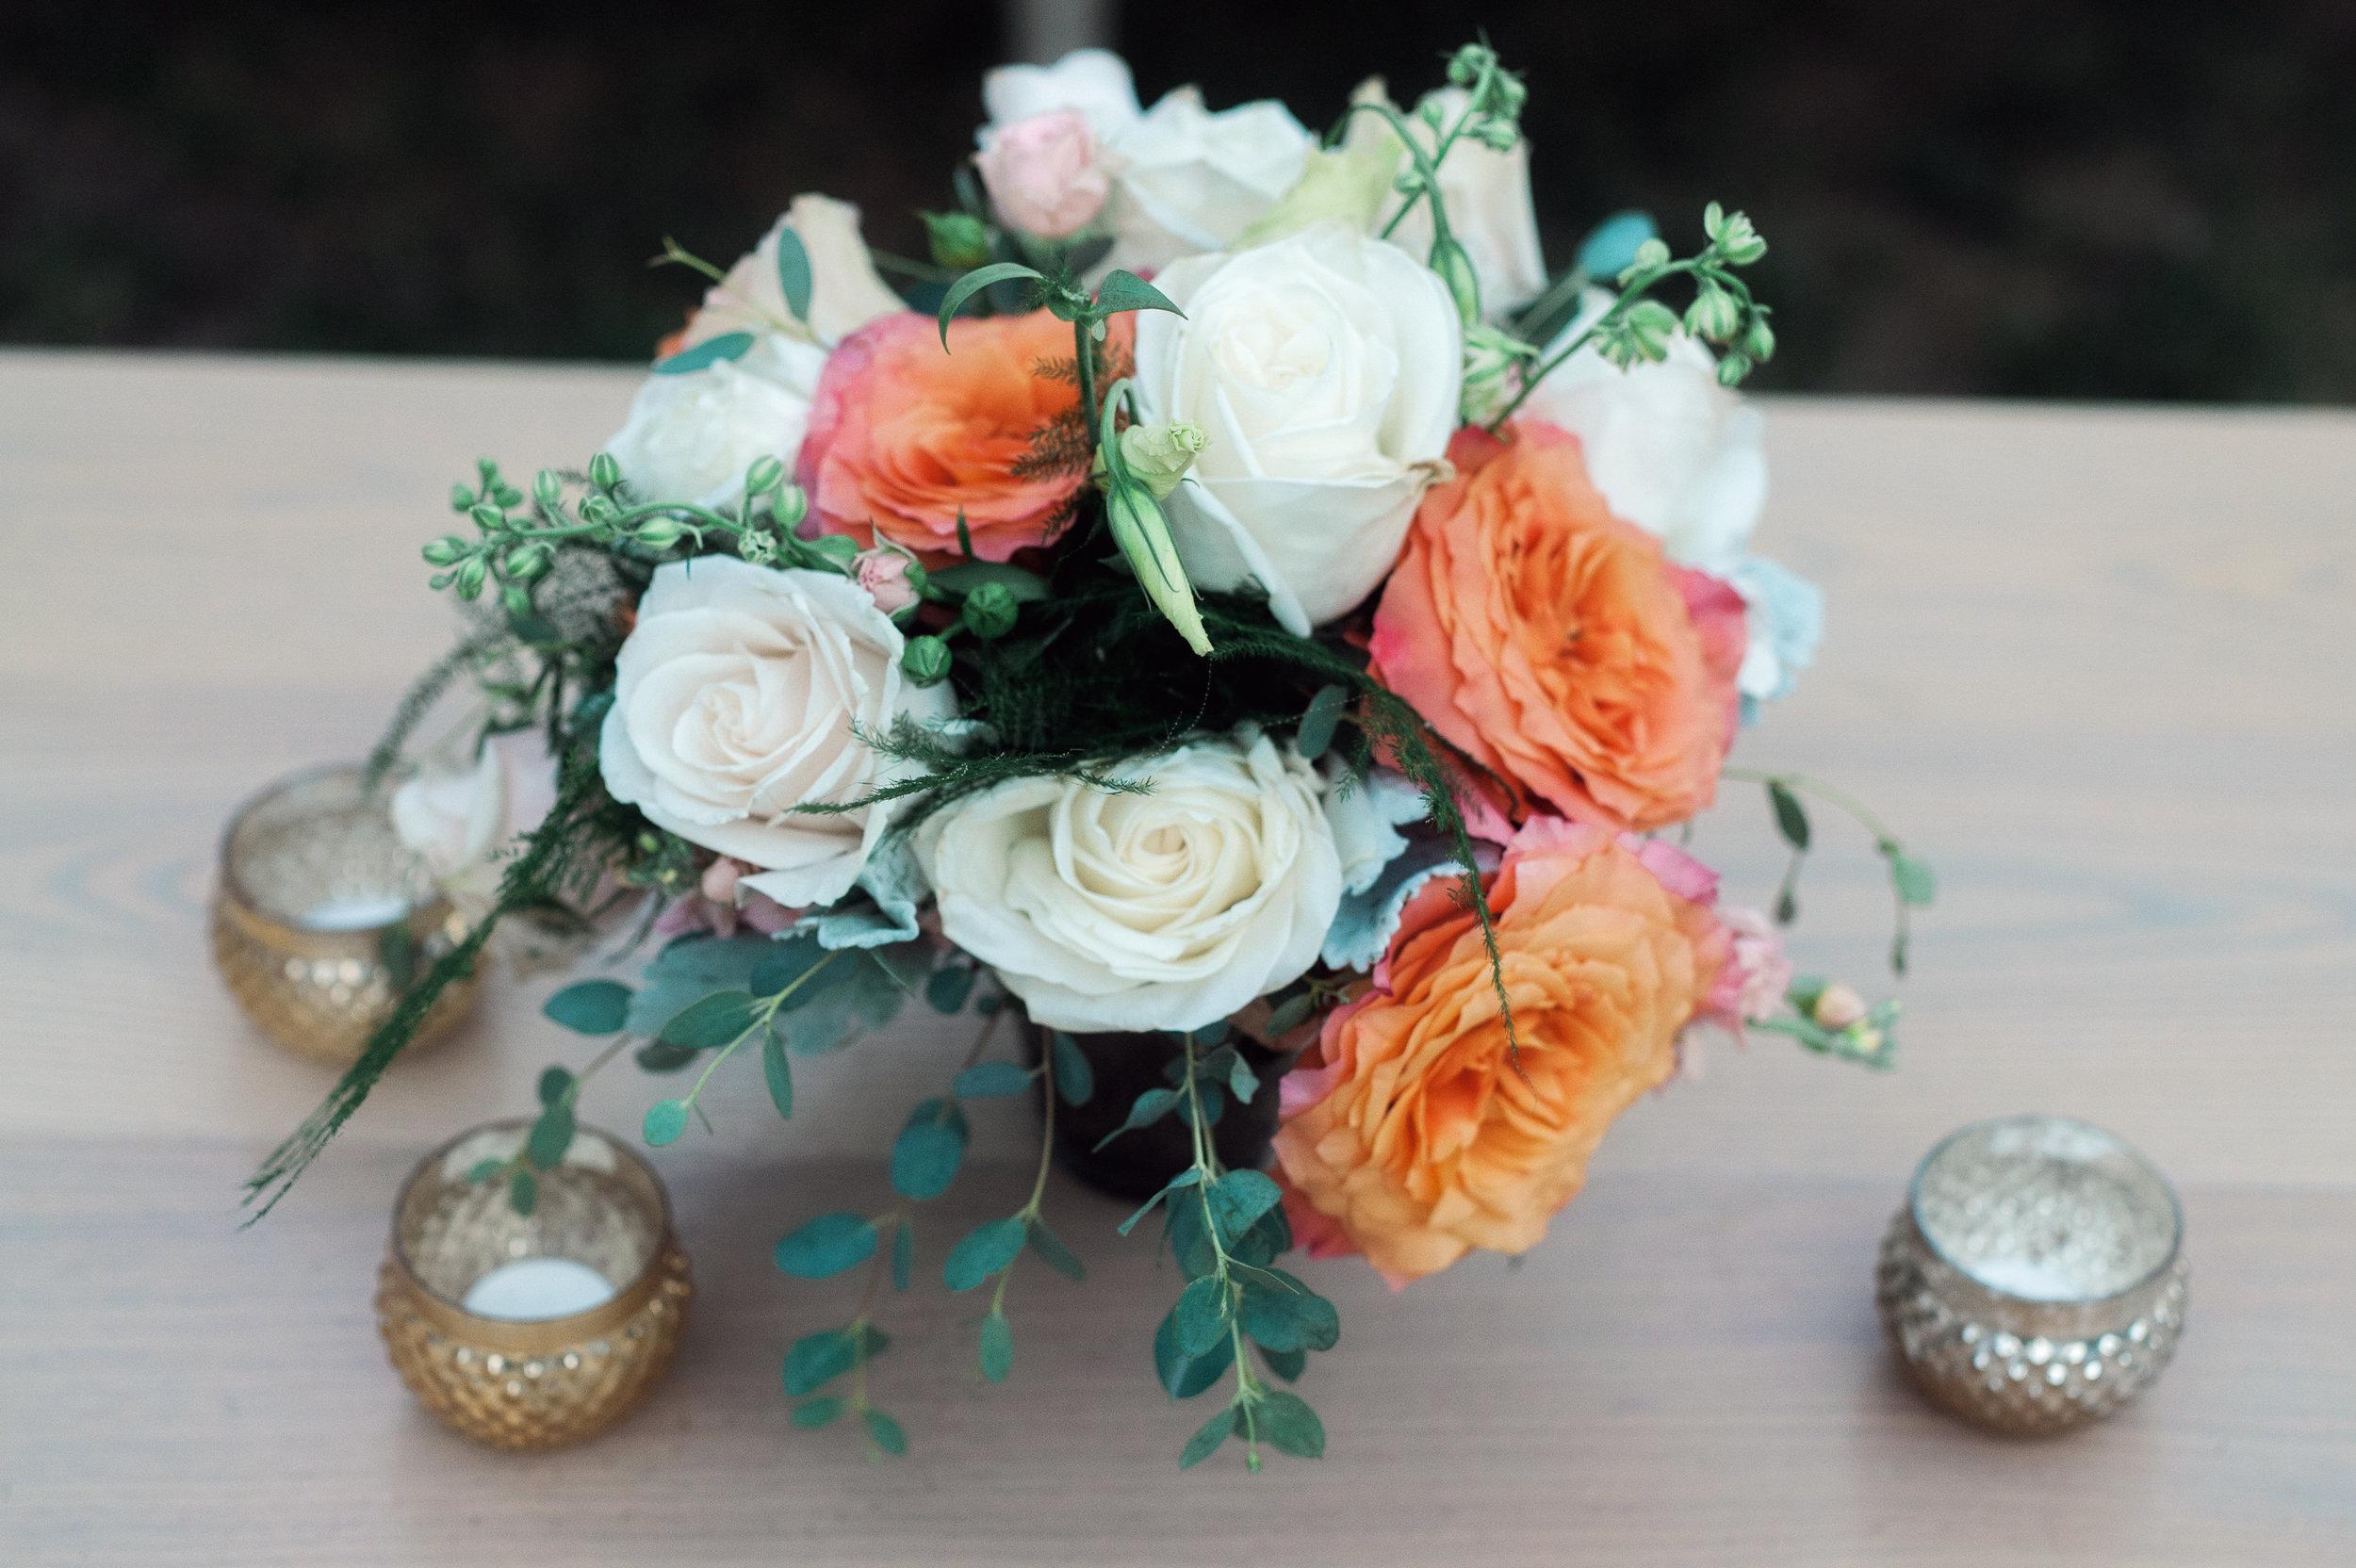 santabarbarawedding.com | Wisteria Lane Flroal Design Studio | Bride and Groom | Garden Roses | Tea Roses | Cocktail Reception Floral with Gold Accents